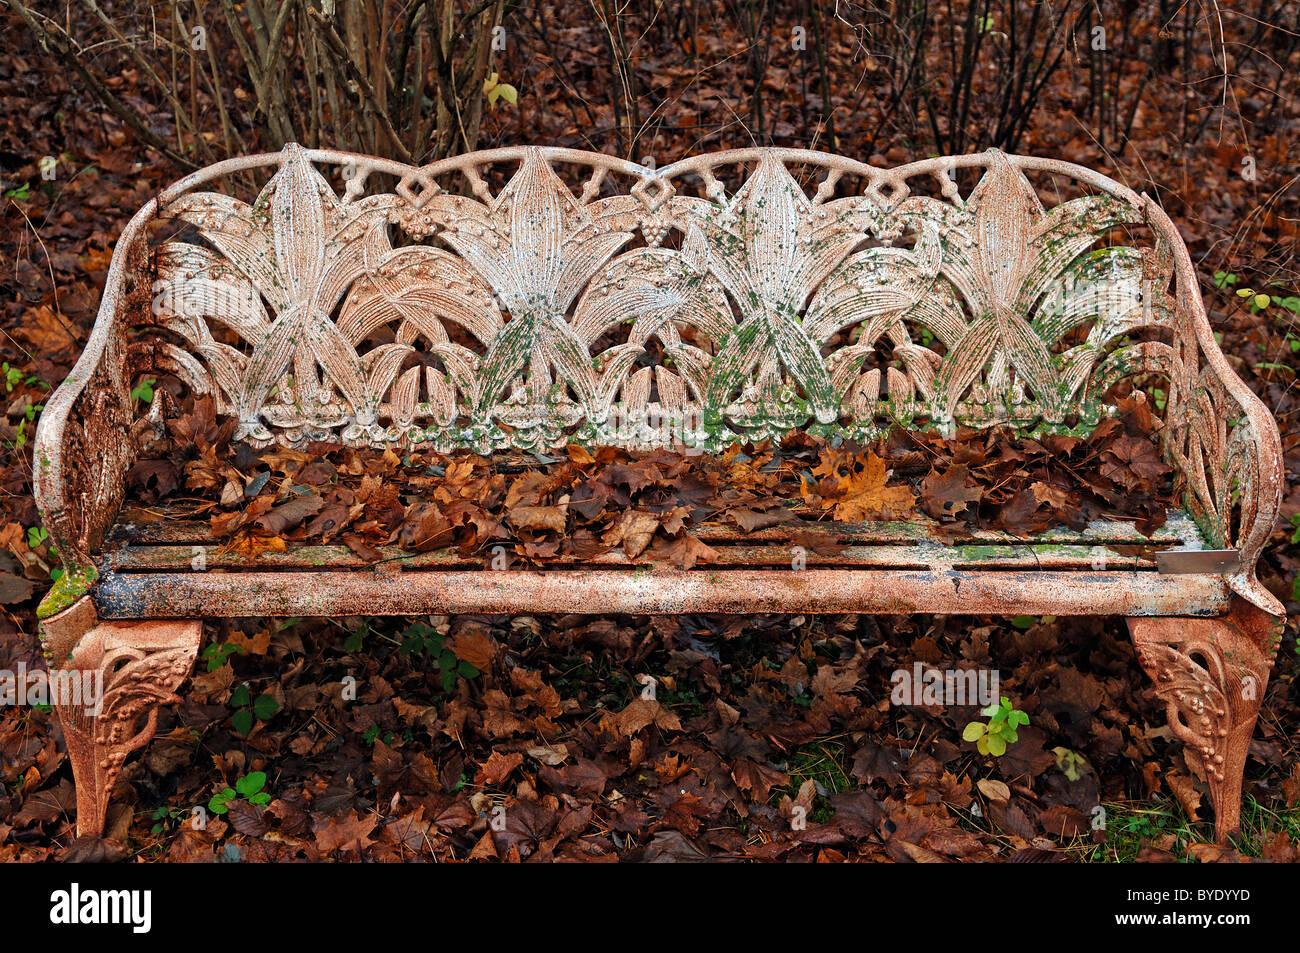 Panchine Da Giardino In Ghisa : Ammenda ghisa panchina da giardino coperto di foglie di autunno